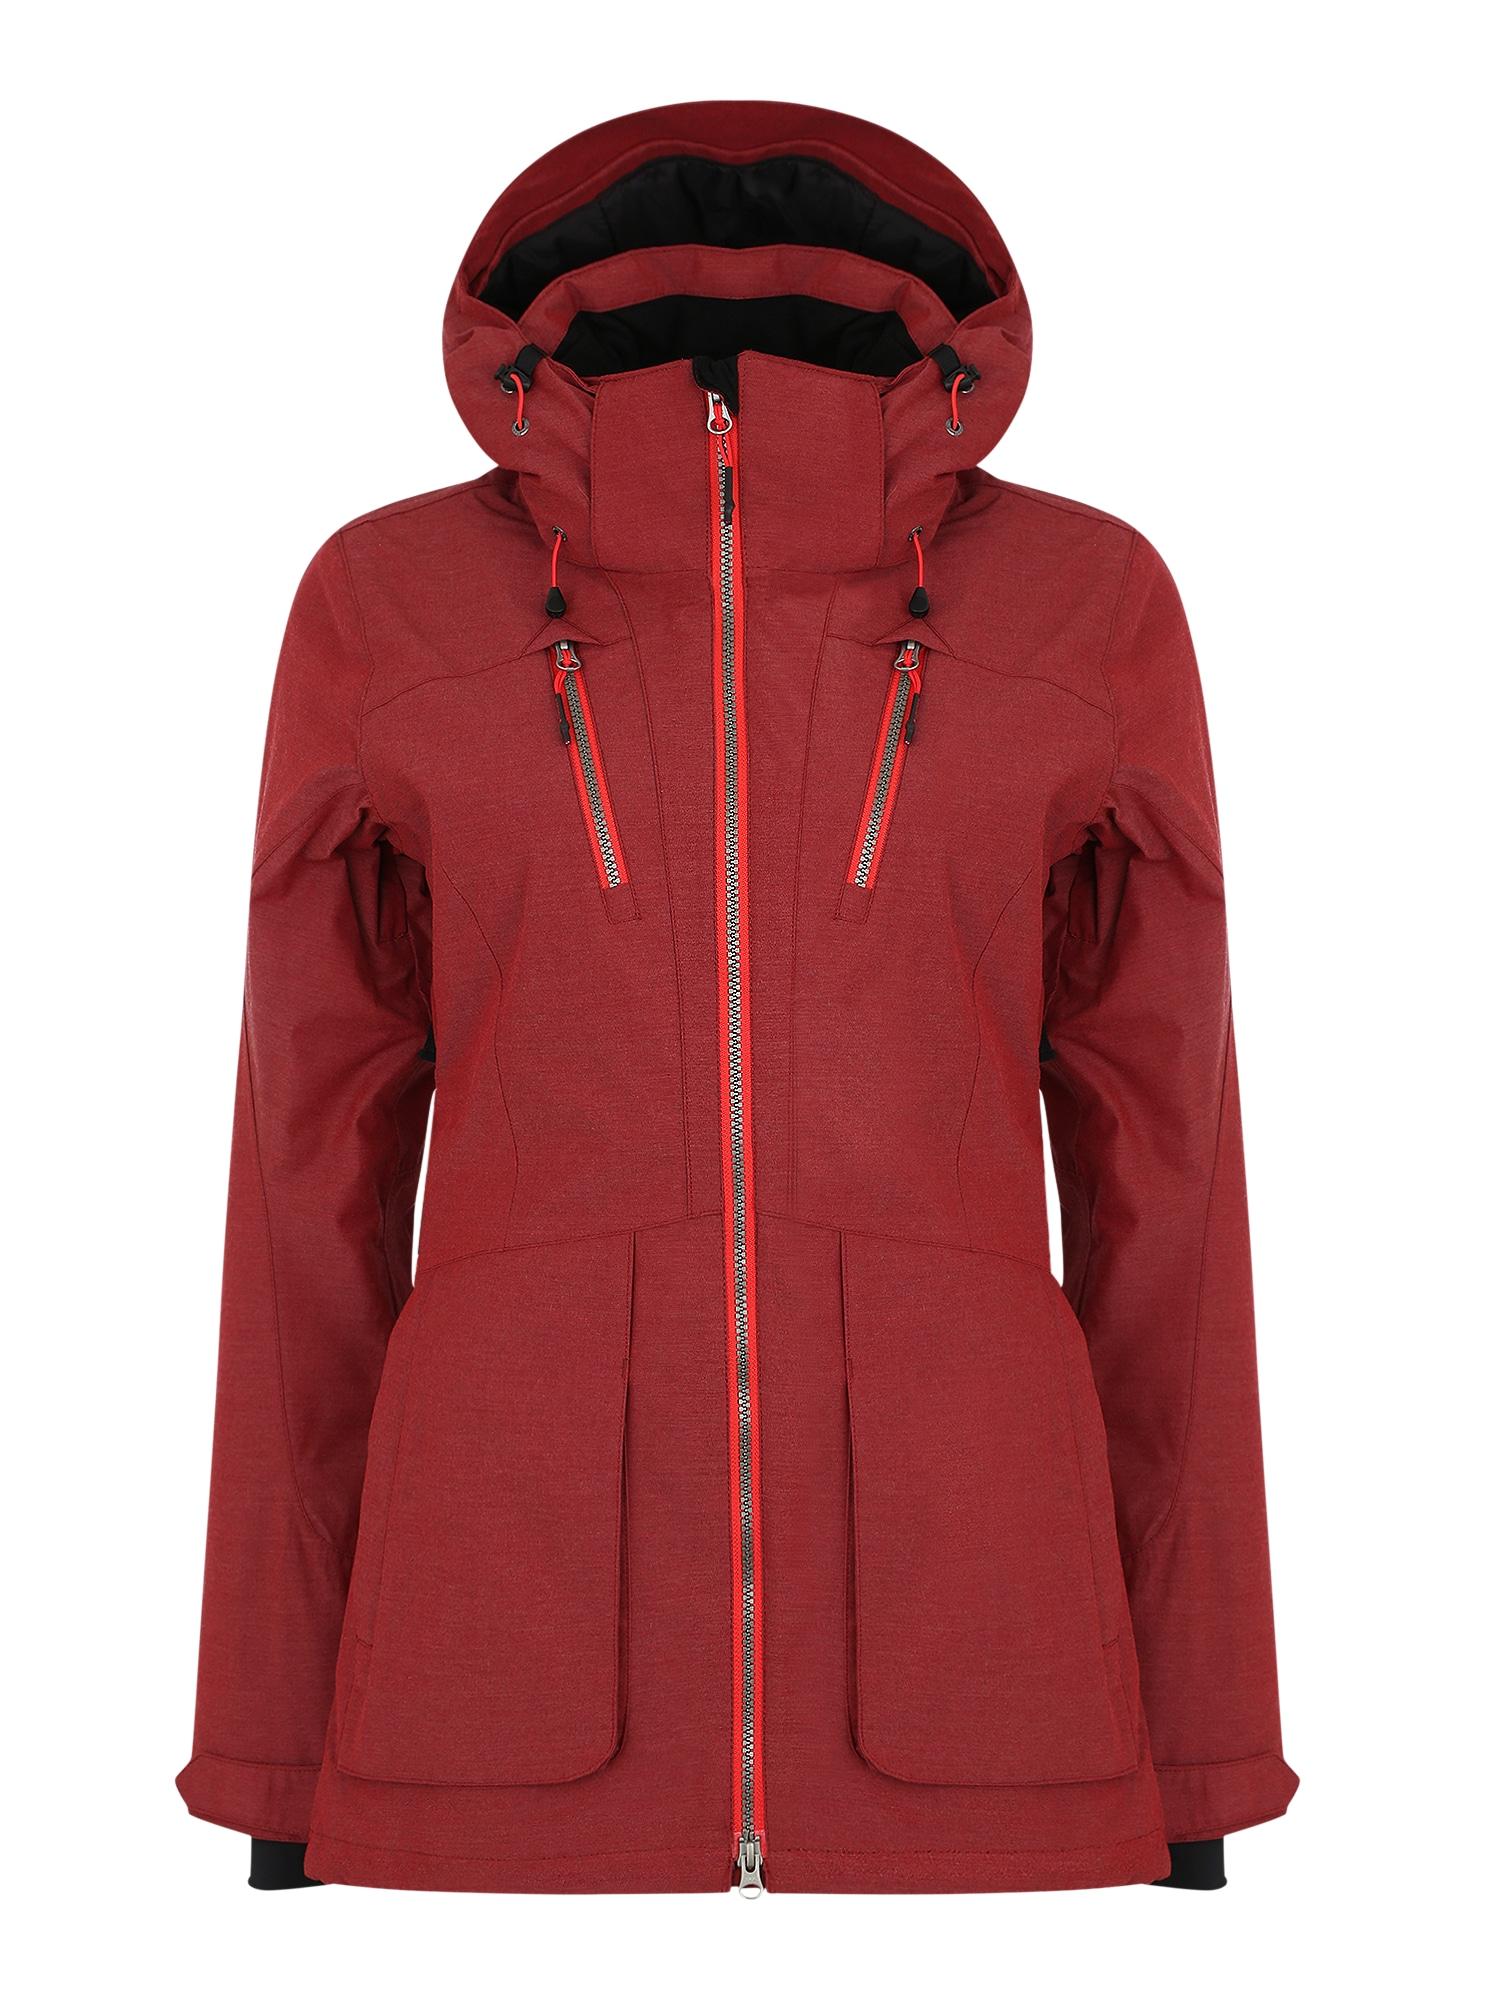 Outdoorová bunda Kelly burgundská červeň ICEPEAK